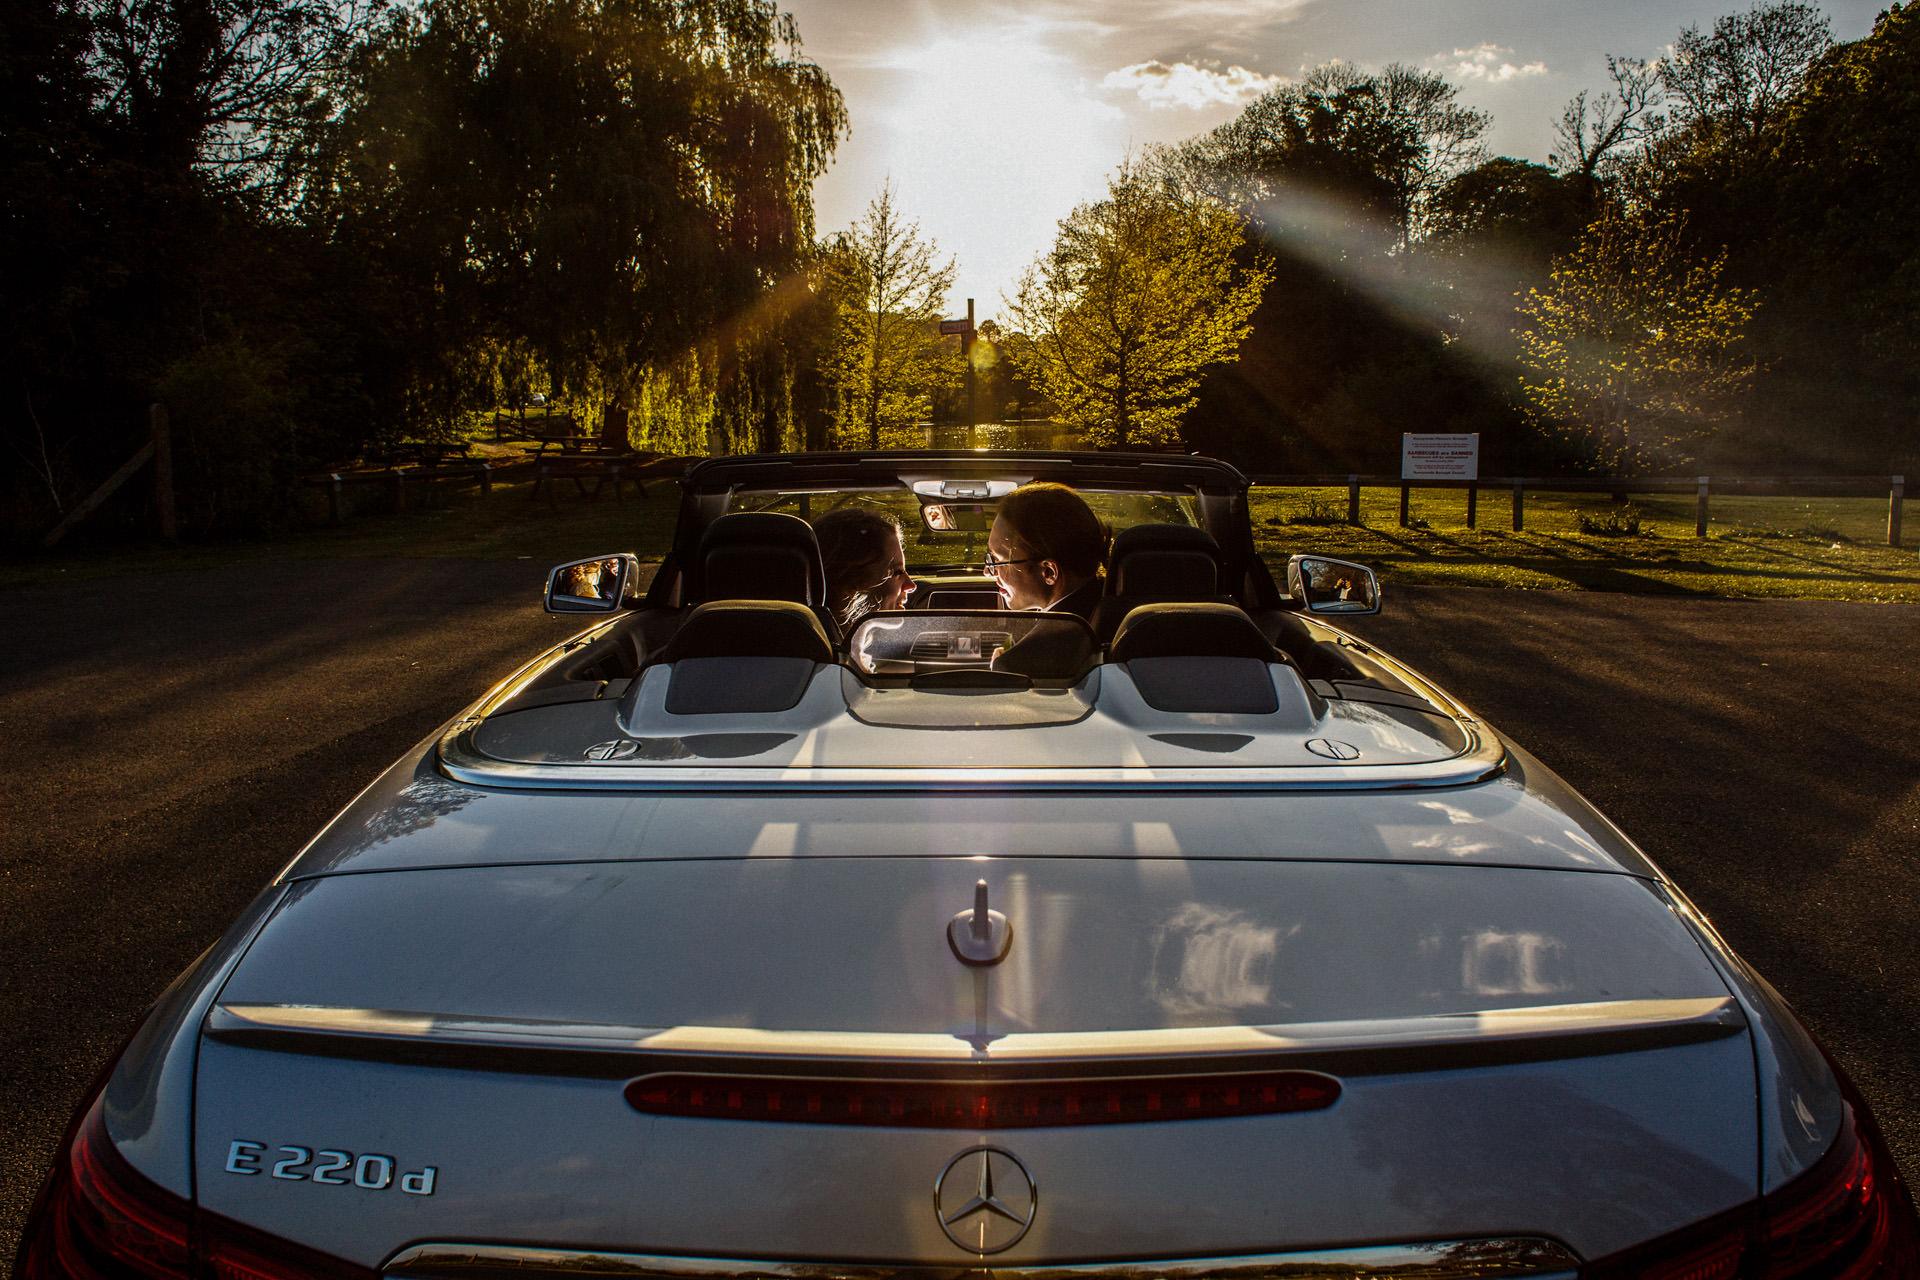 Polish London Wedding Photography Portfolio couple in the car